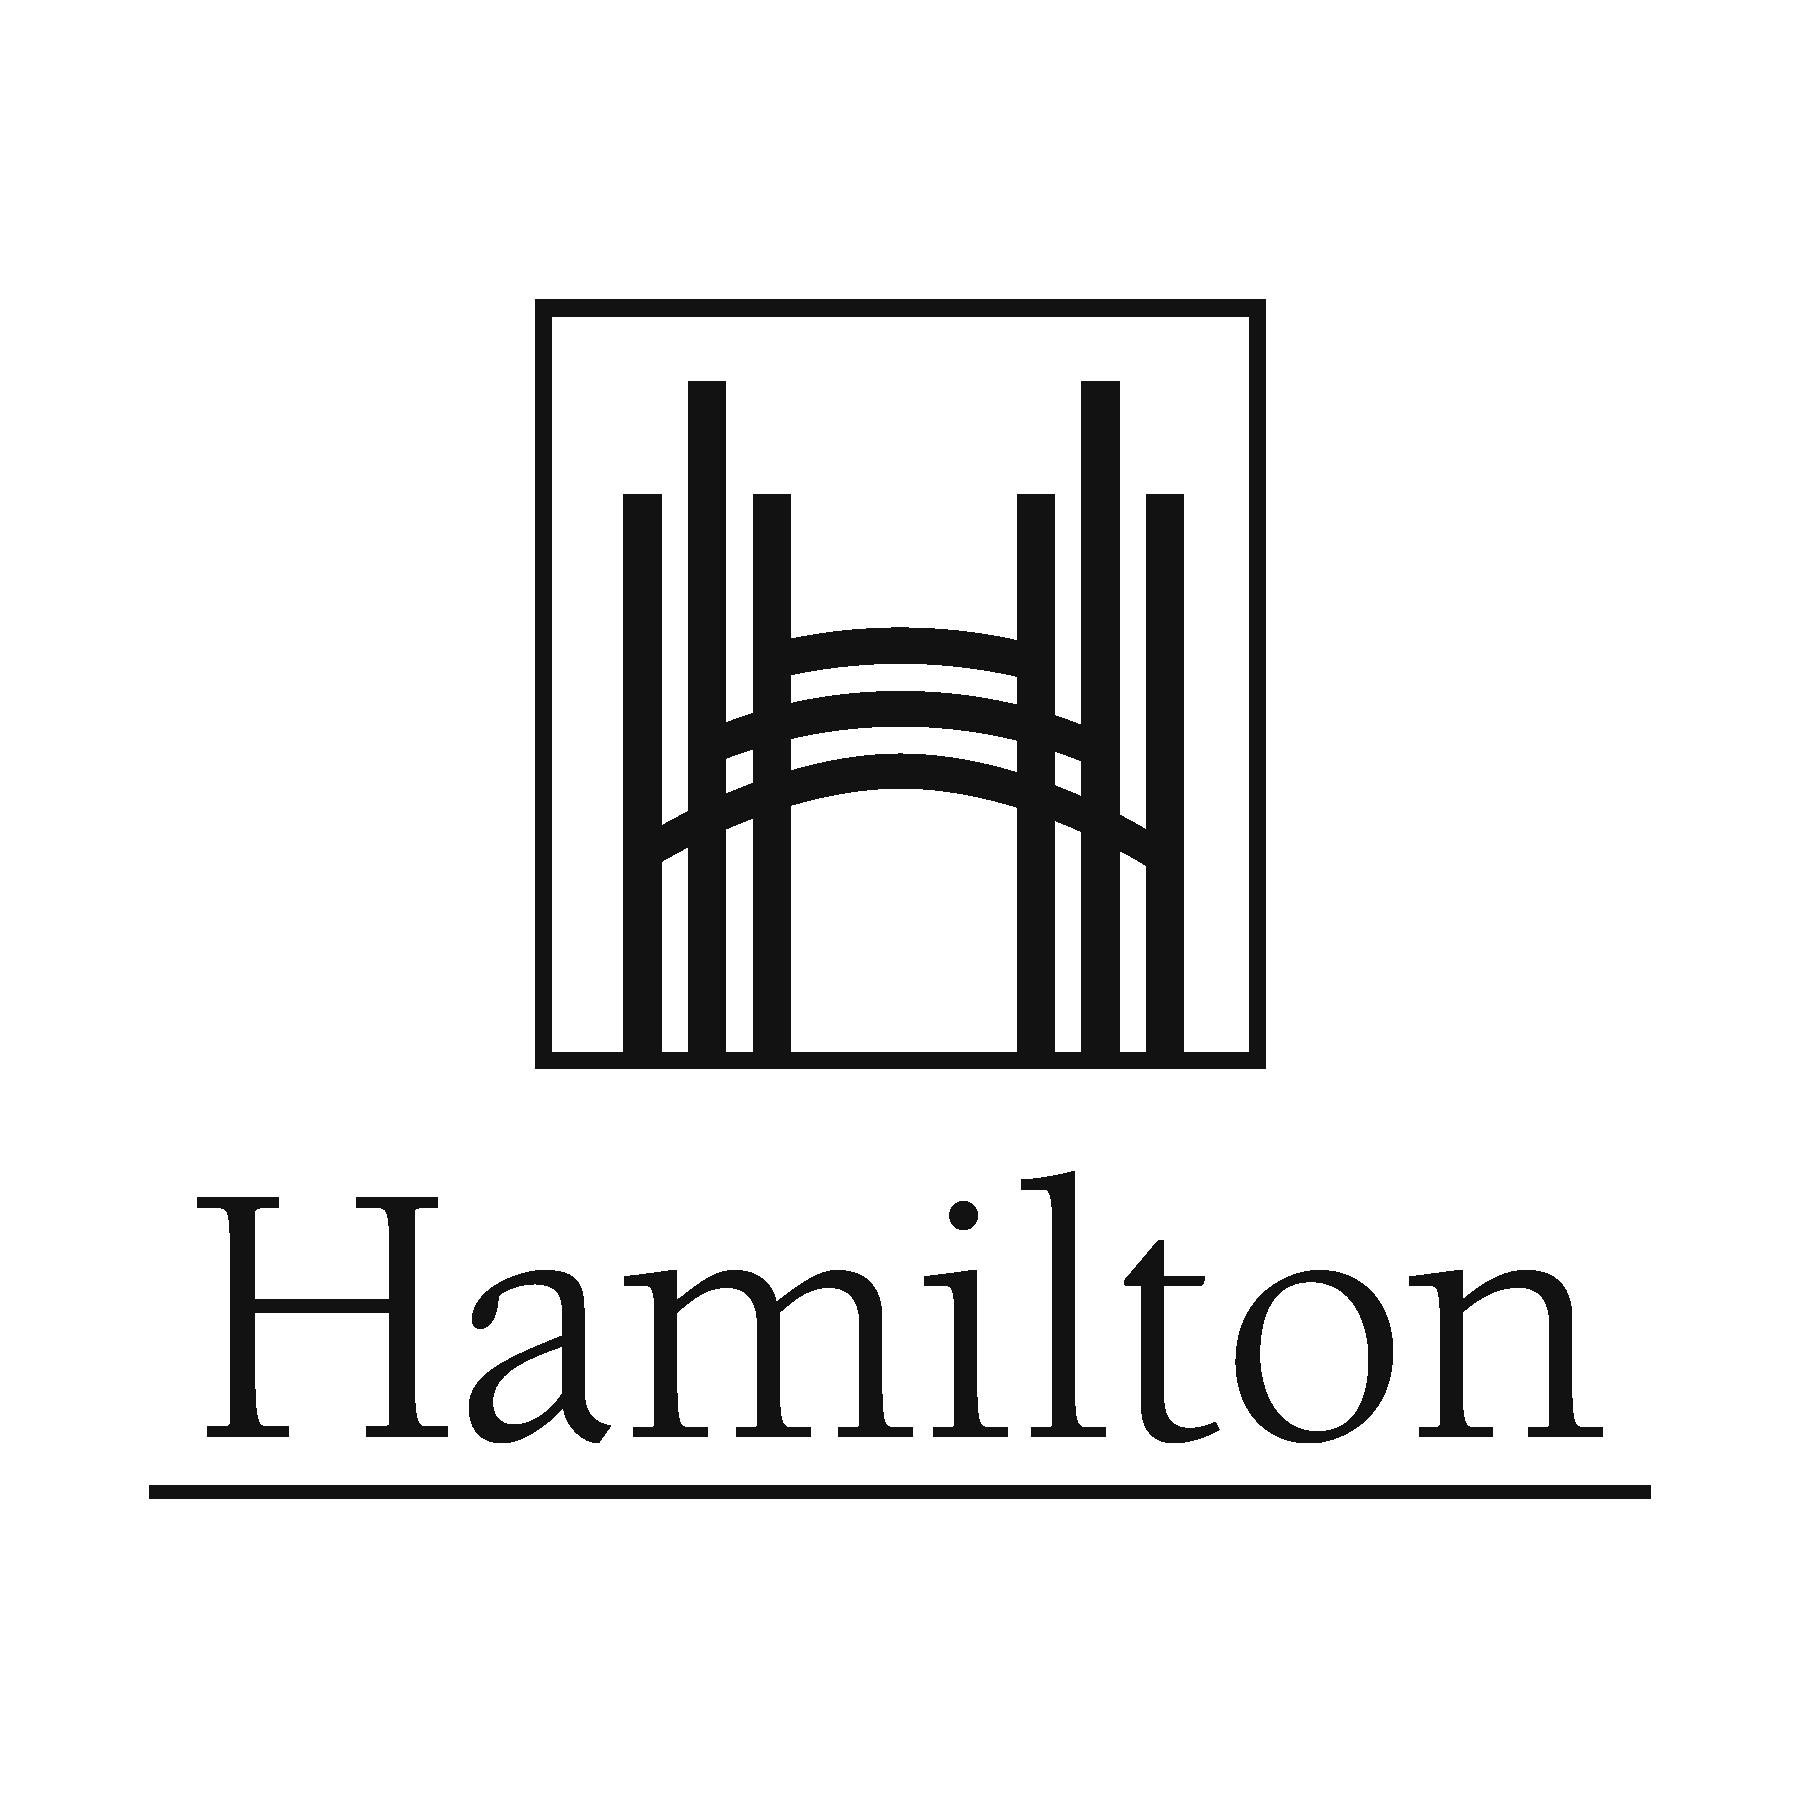 HamiltonLogoBLACKoutline-2018.png